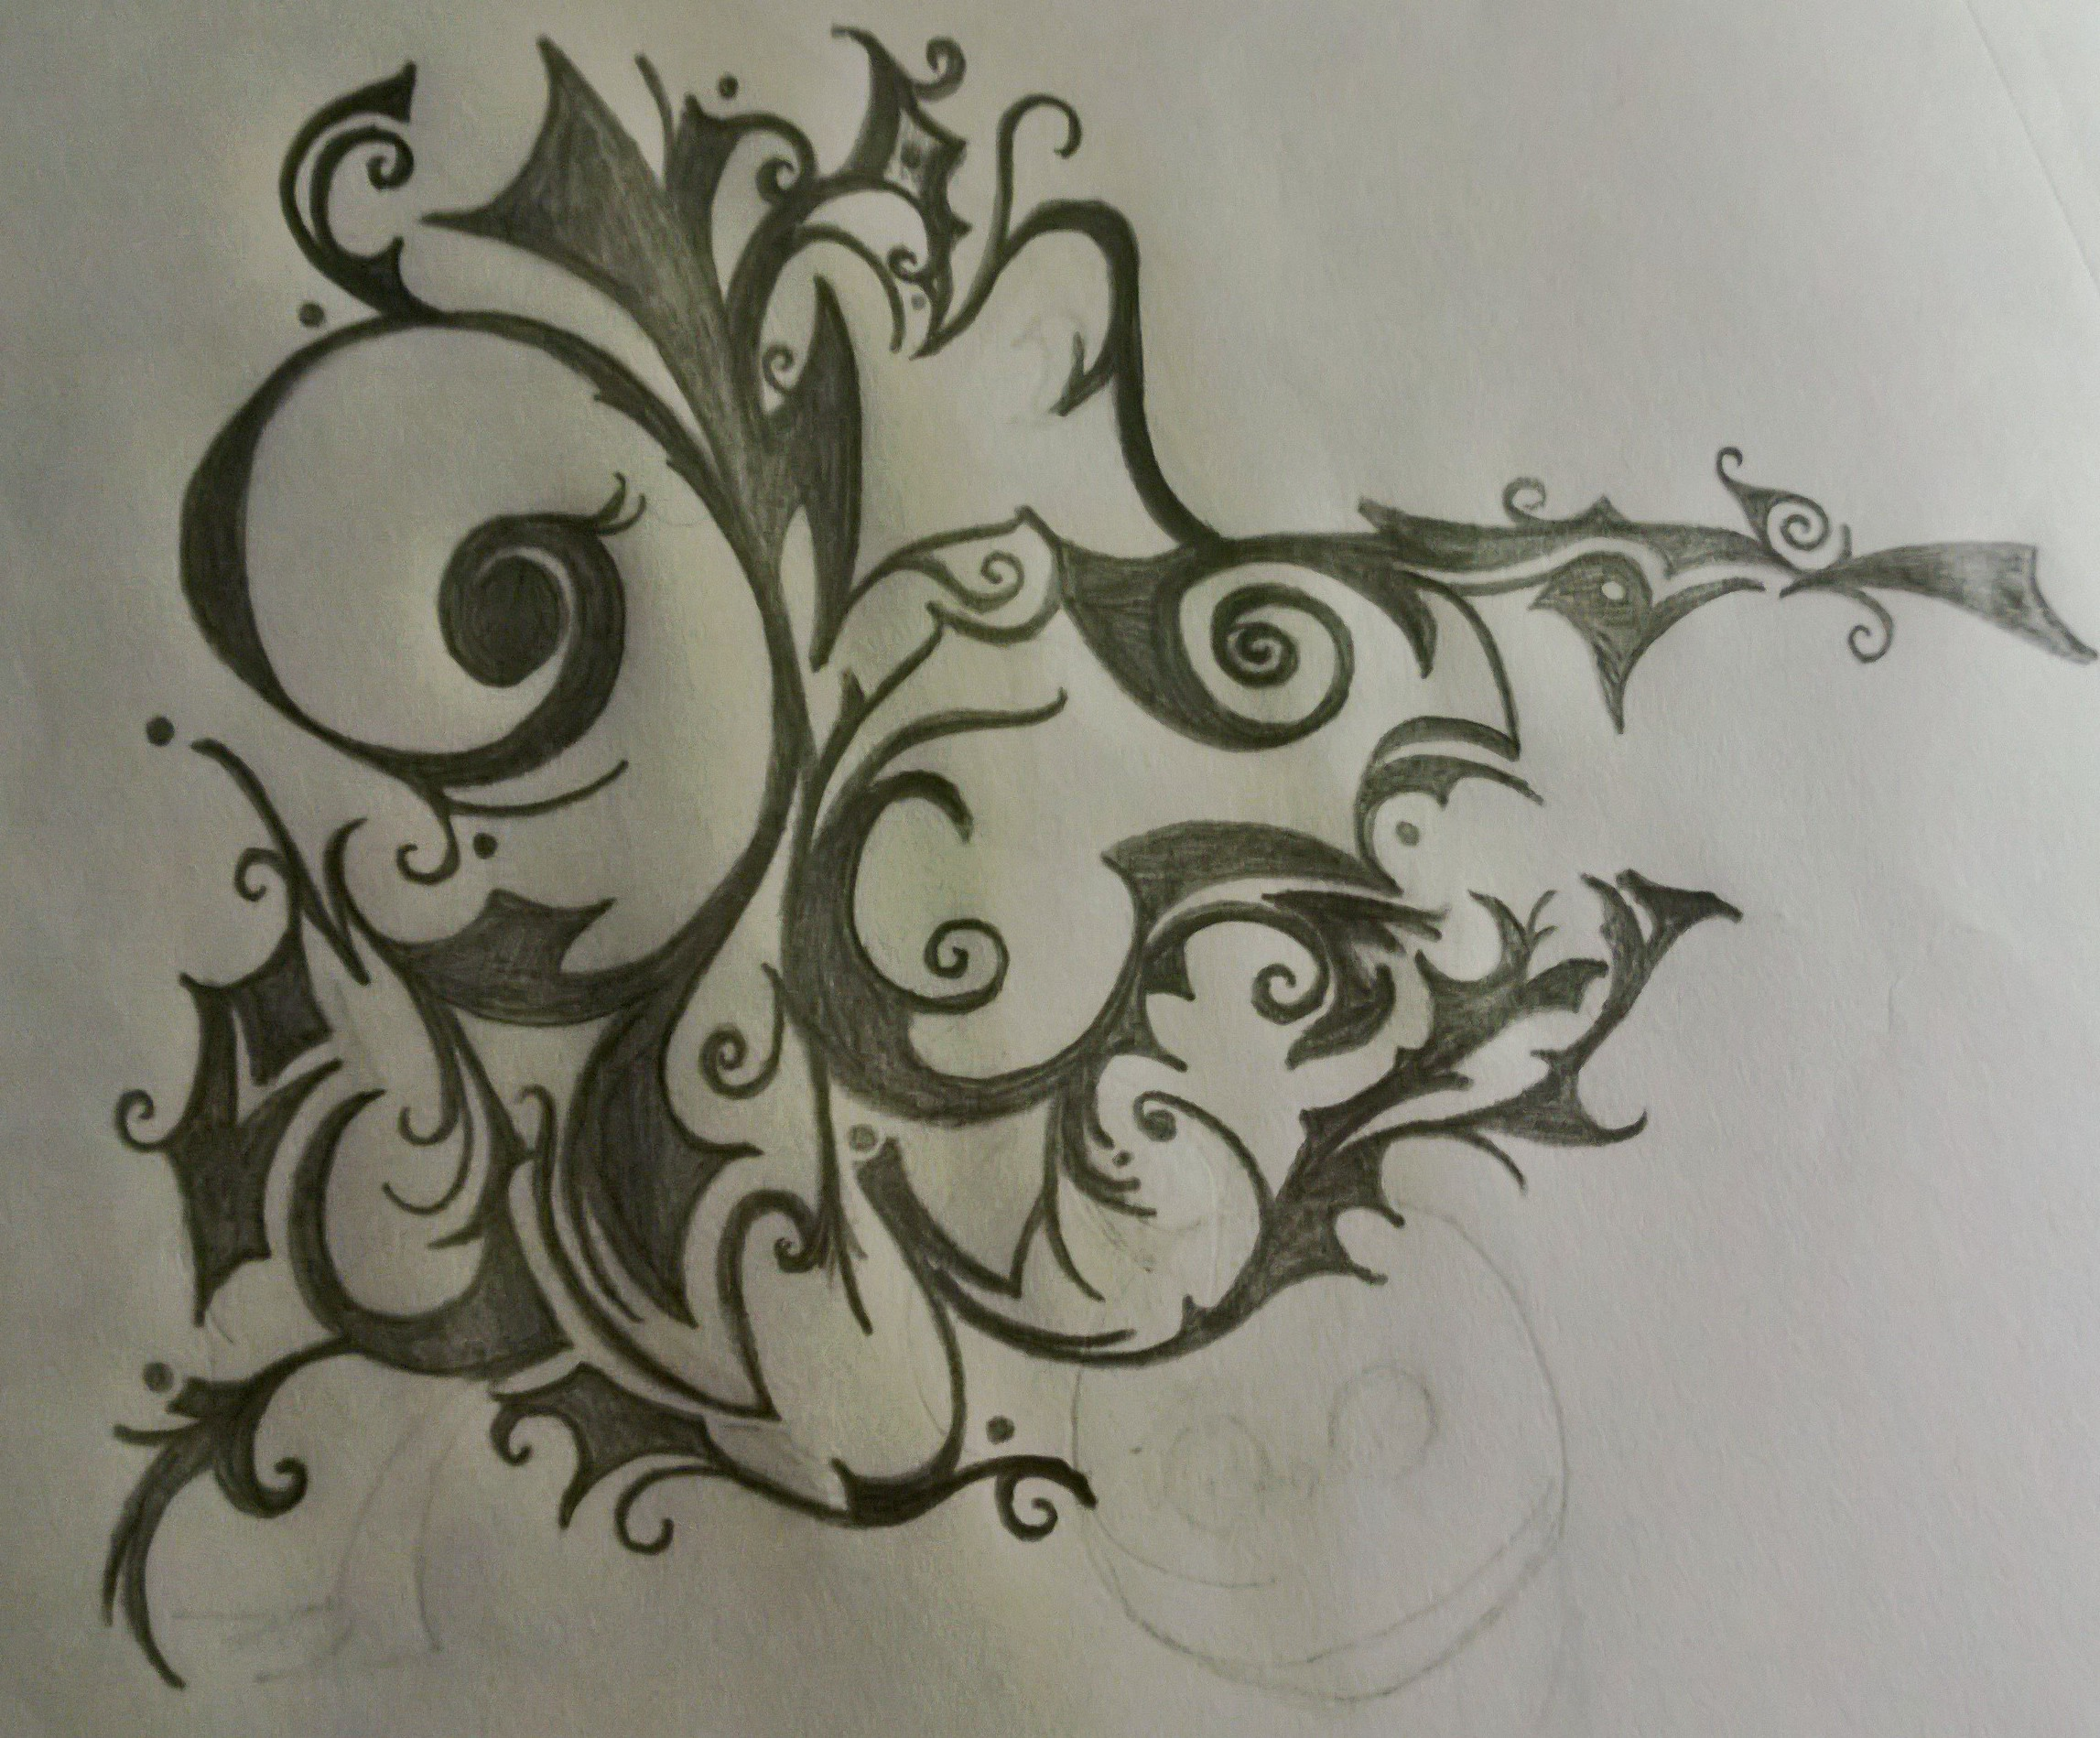 Sketch Art 3 by yocuri